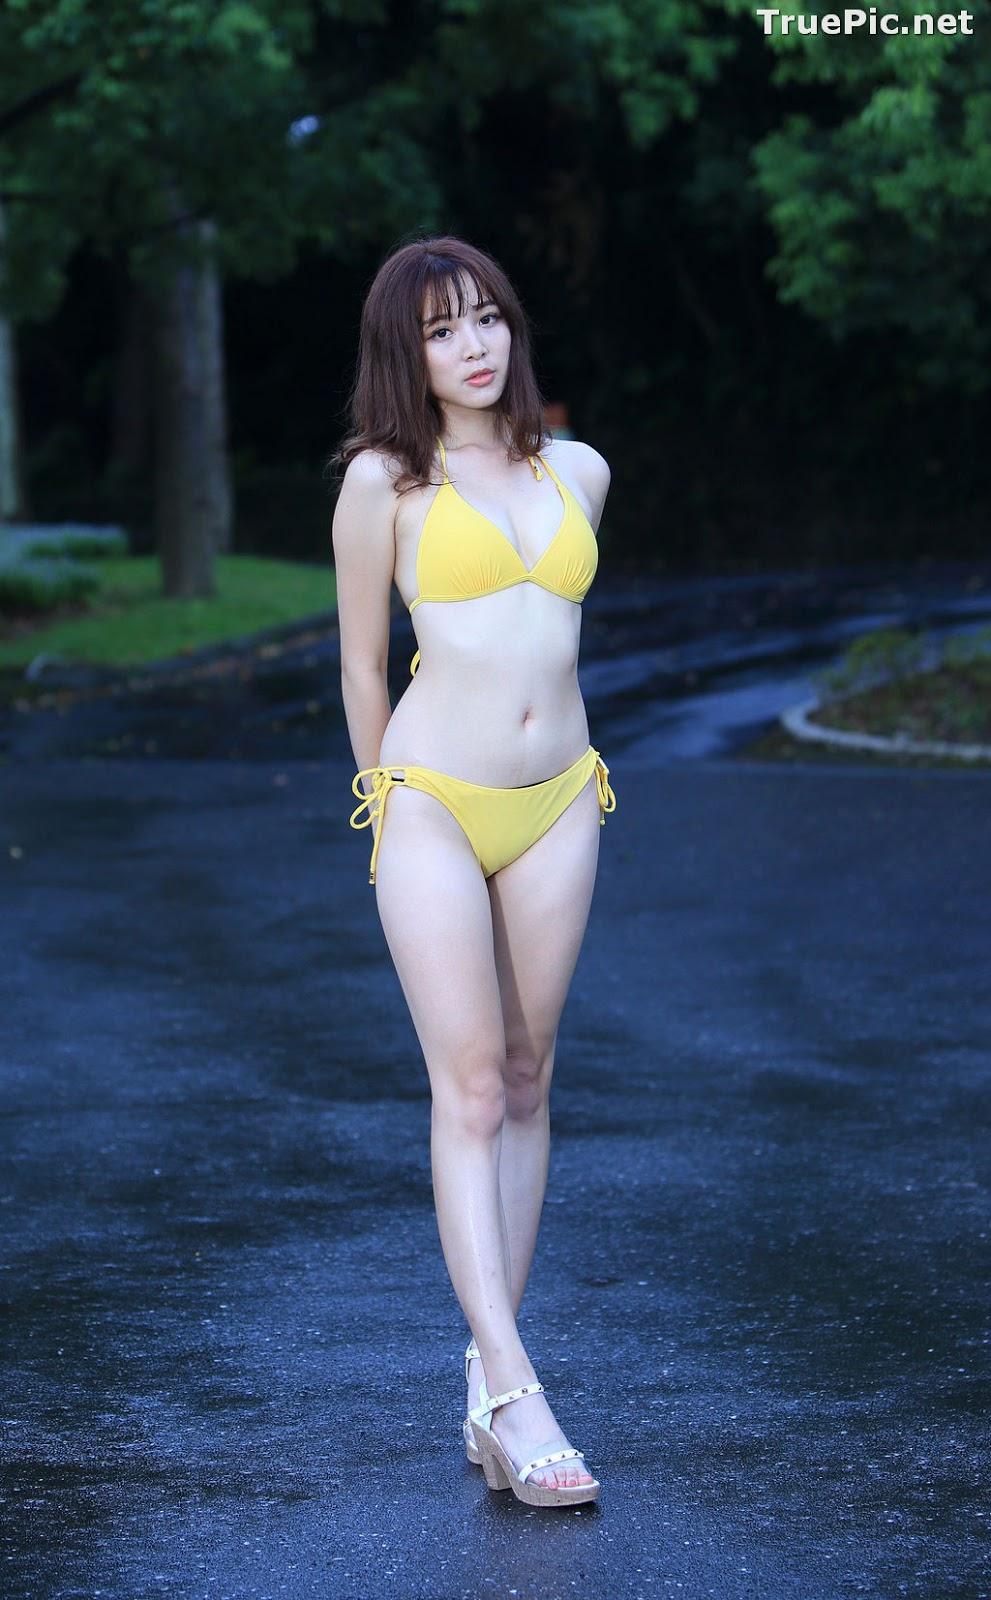 Image Taiwanese Model - Ash Ley - Yellow Bikini at Taipei Water Museum - TruePic.net - Picture-9